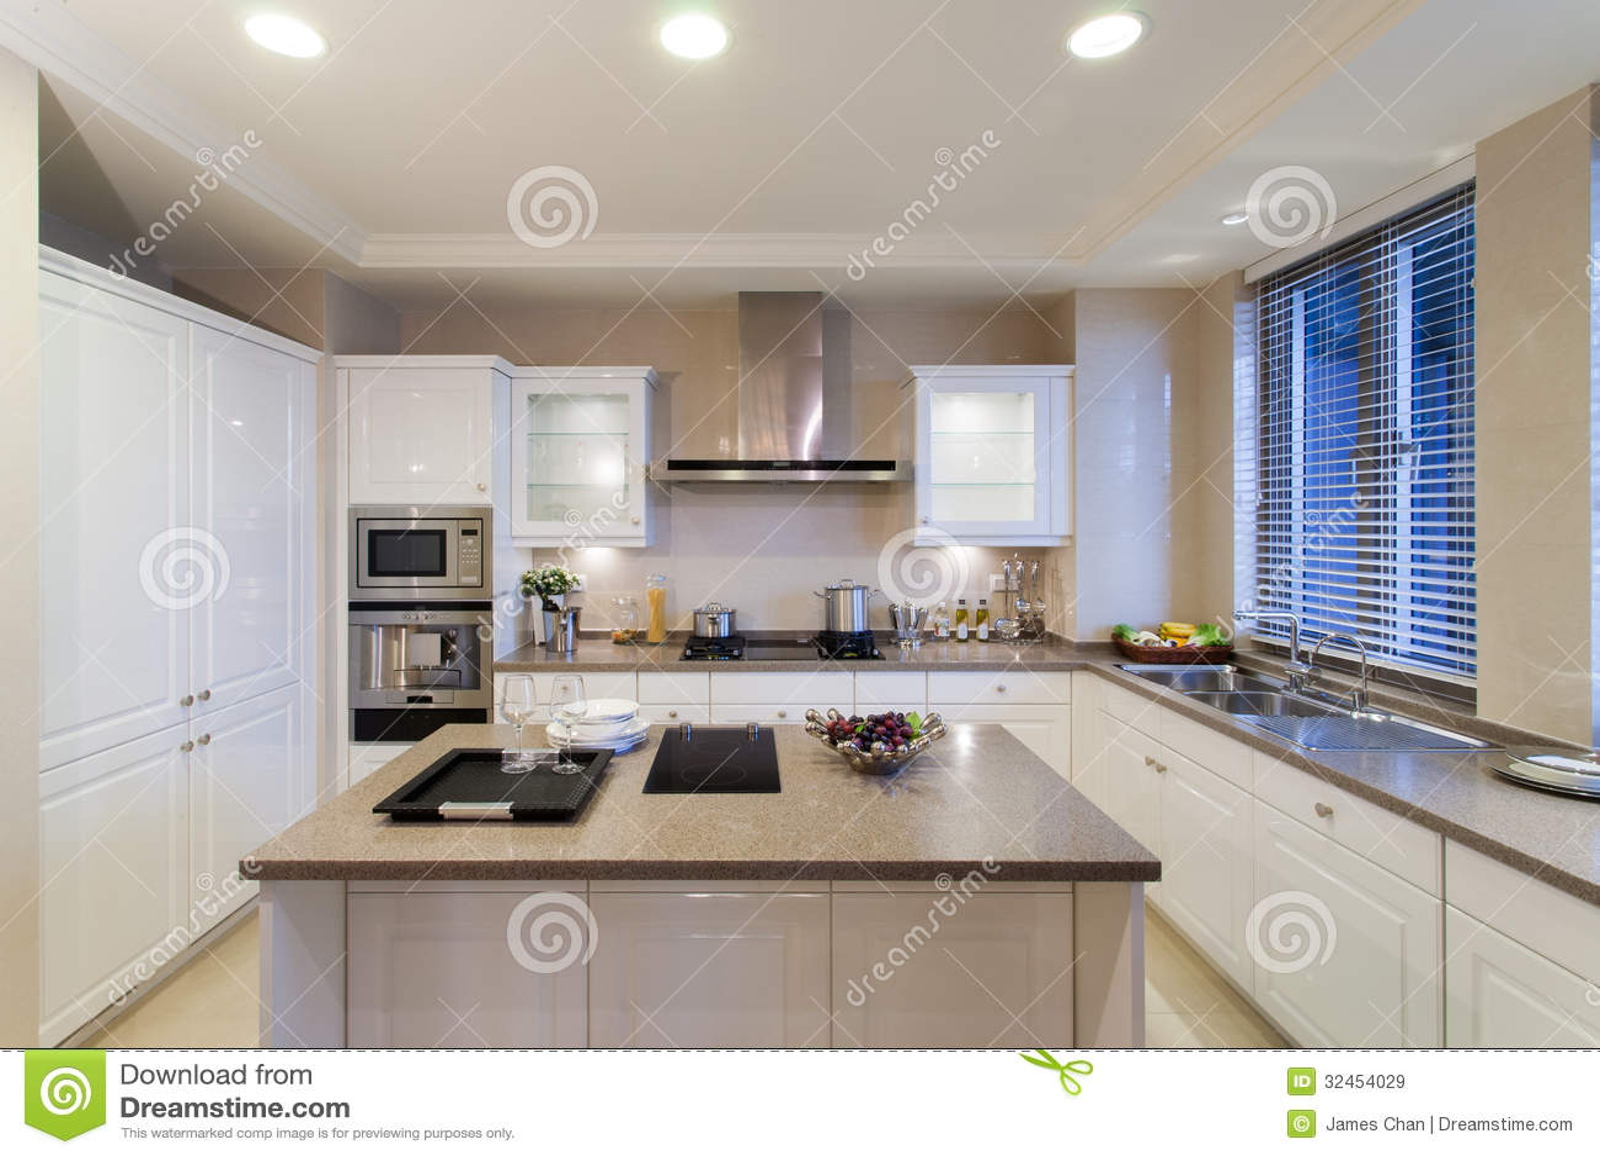 Moderne keuken royalty vrije stock afbeeldingen afbeelding 32454029 - Moderne keuken deco keuken ...